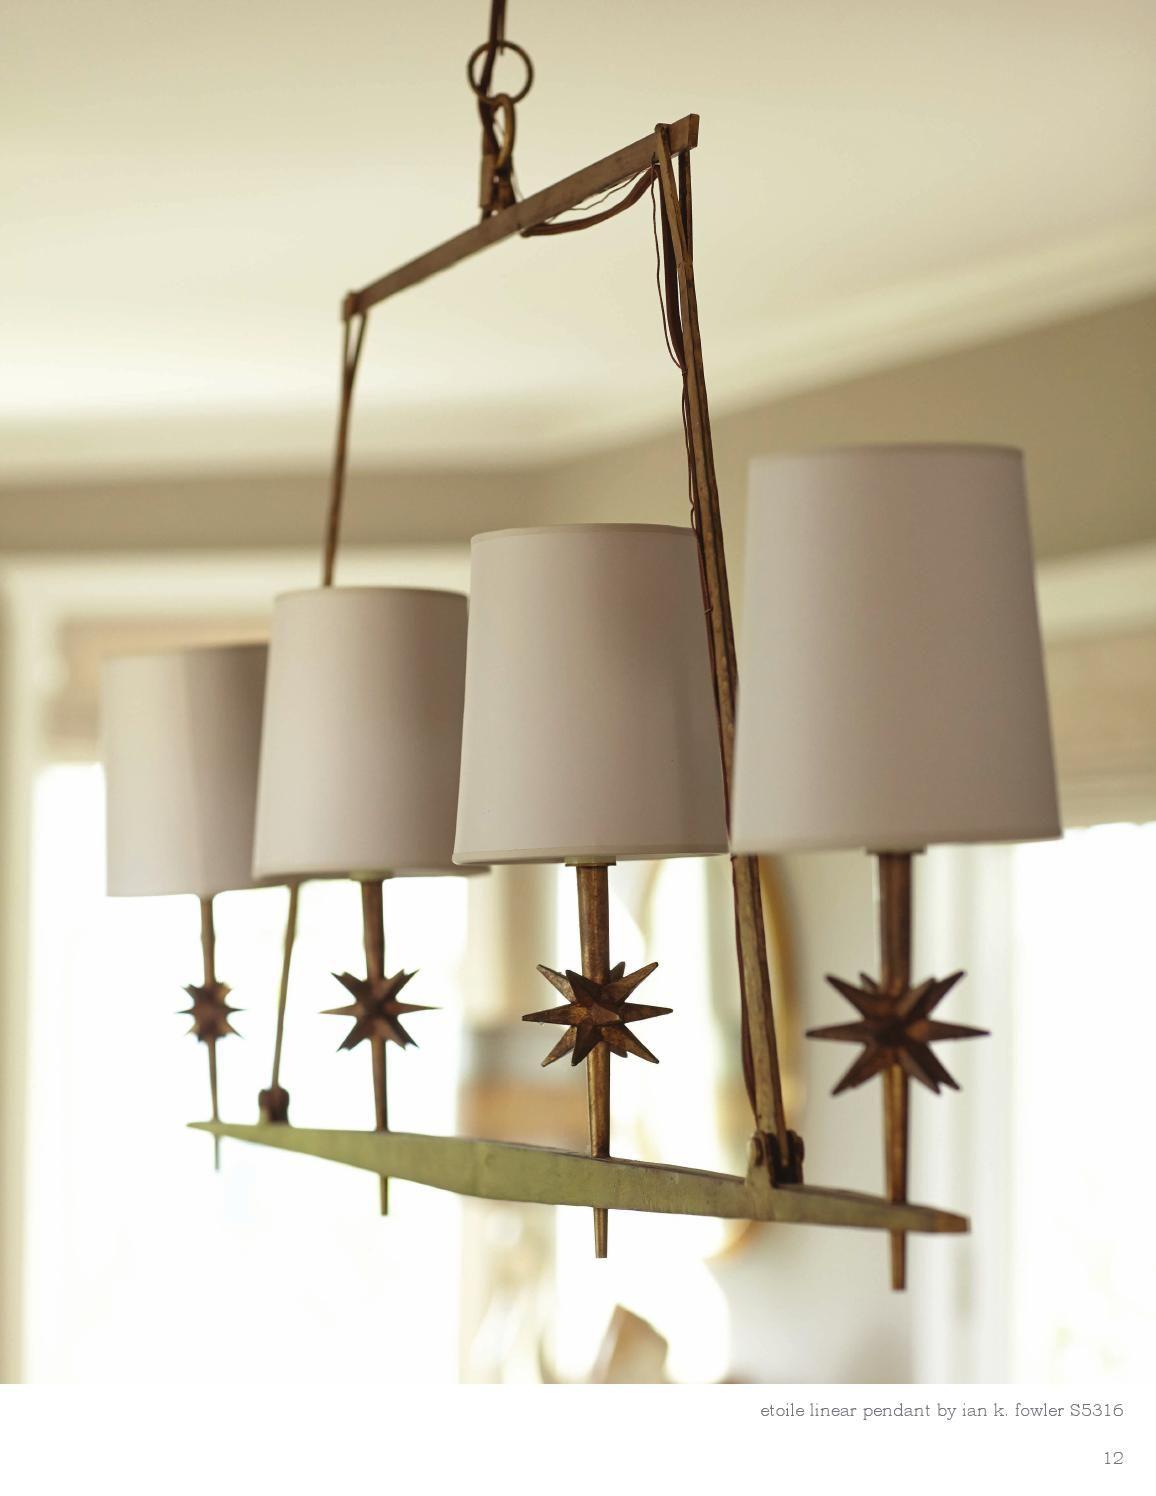 circa lighting lookbook vol 1 circa lighting lights. Black Bedroom Furniture Sets. Home Design Ideas